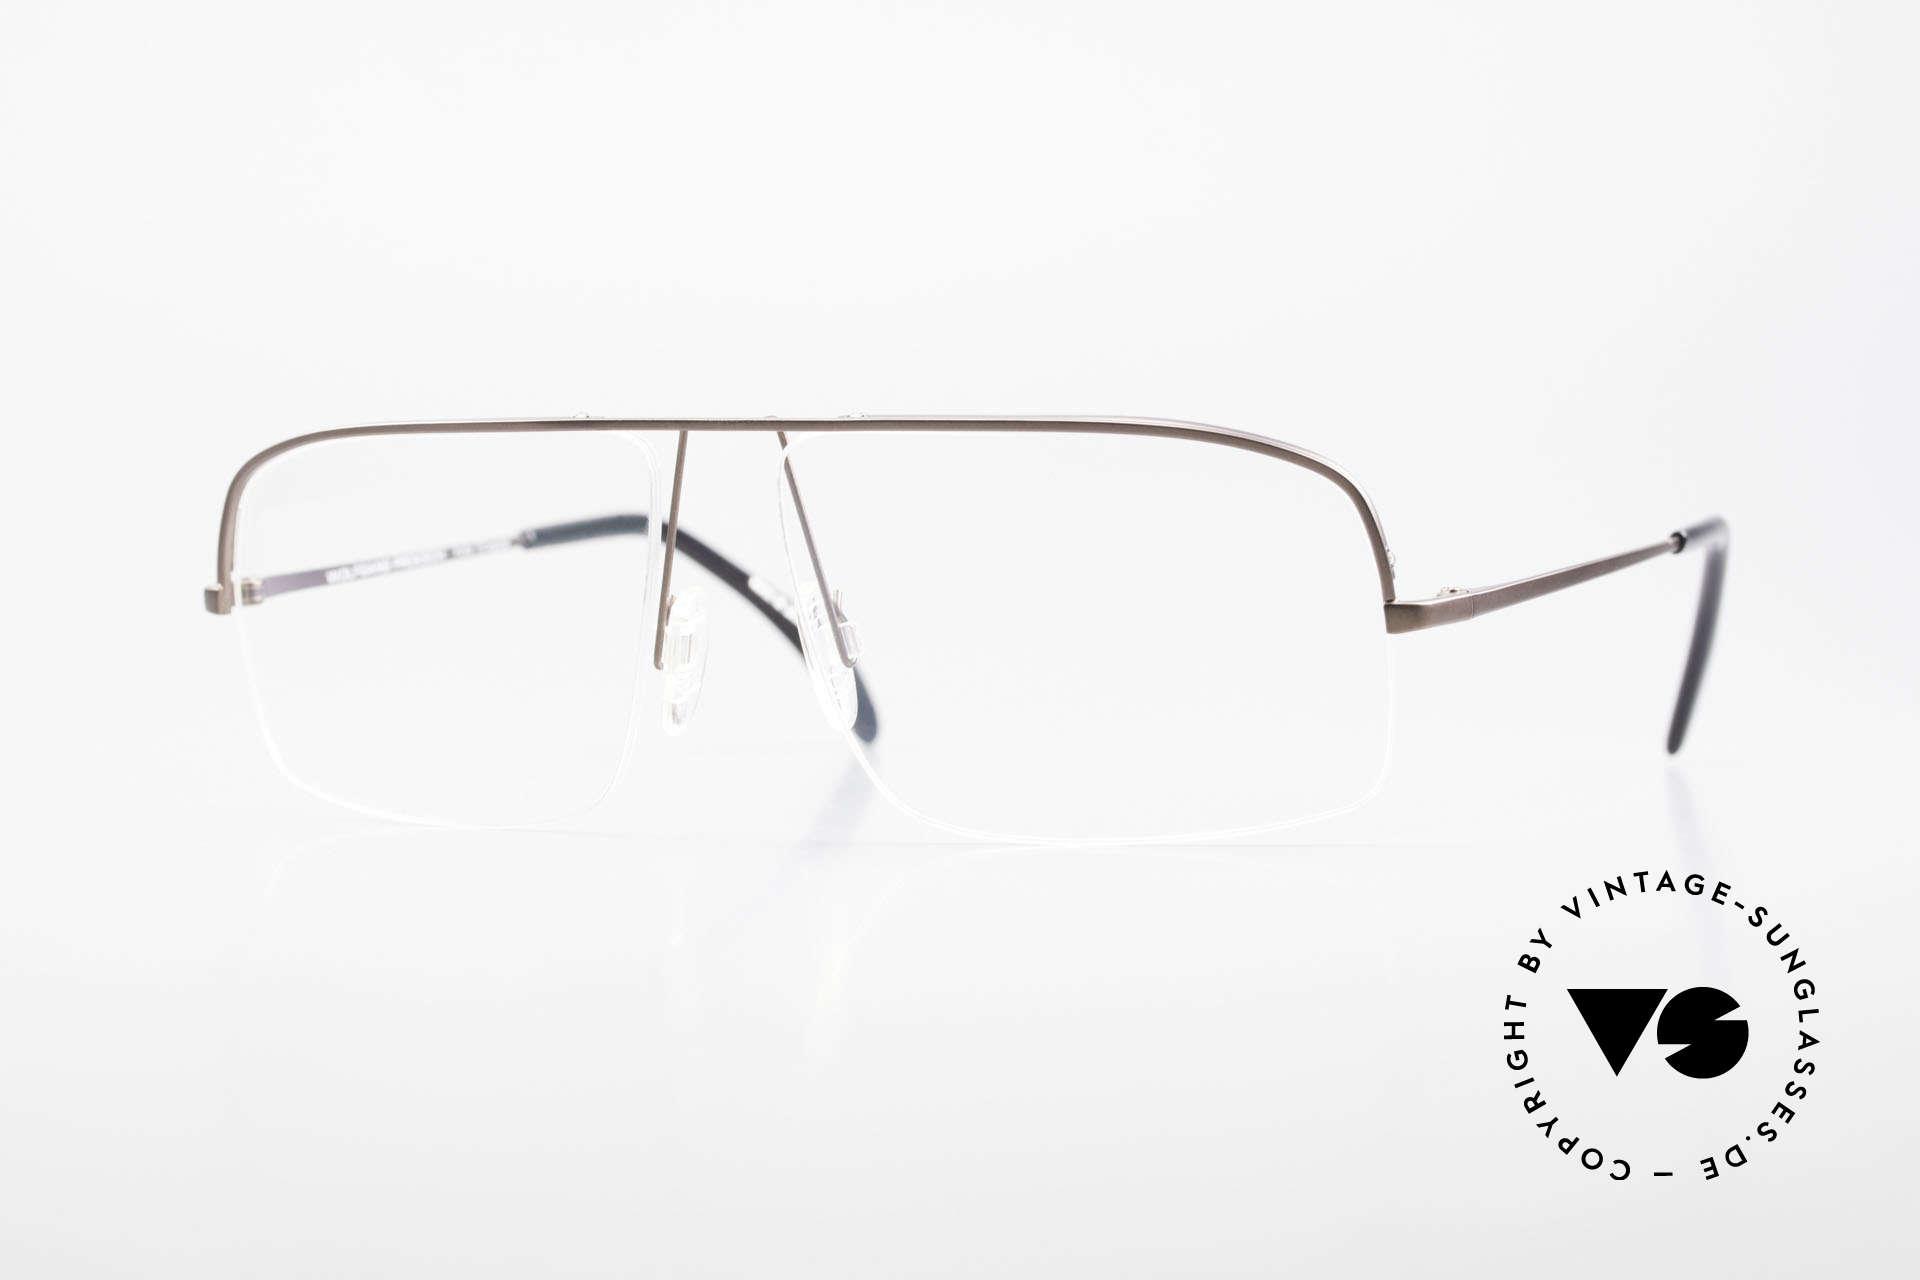 Wolfgang Proksch WP0103 New Tear Drop Titanium Frame, Wolfgang Proksch VINTAGE eyeglasses from 1999, Made for Men